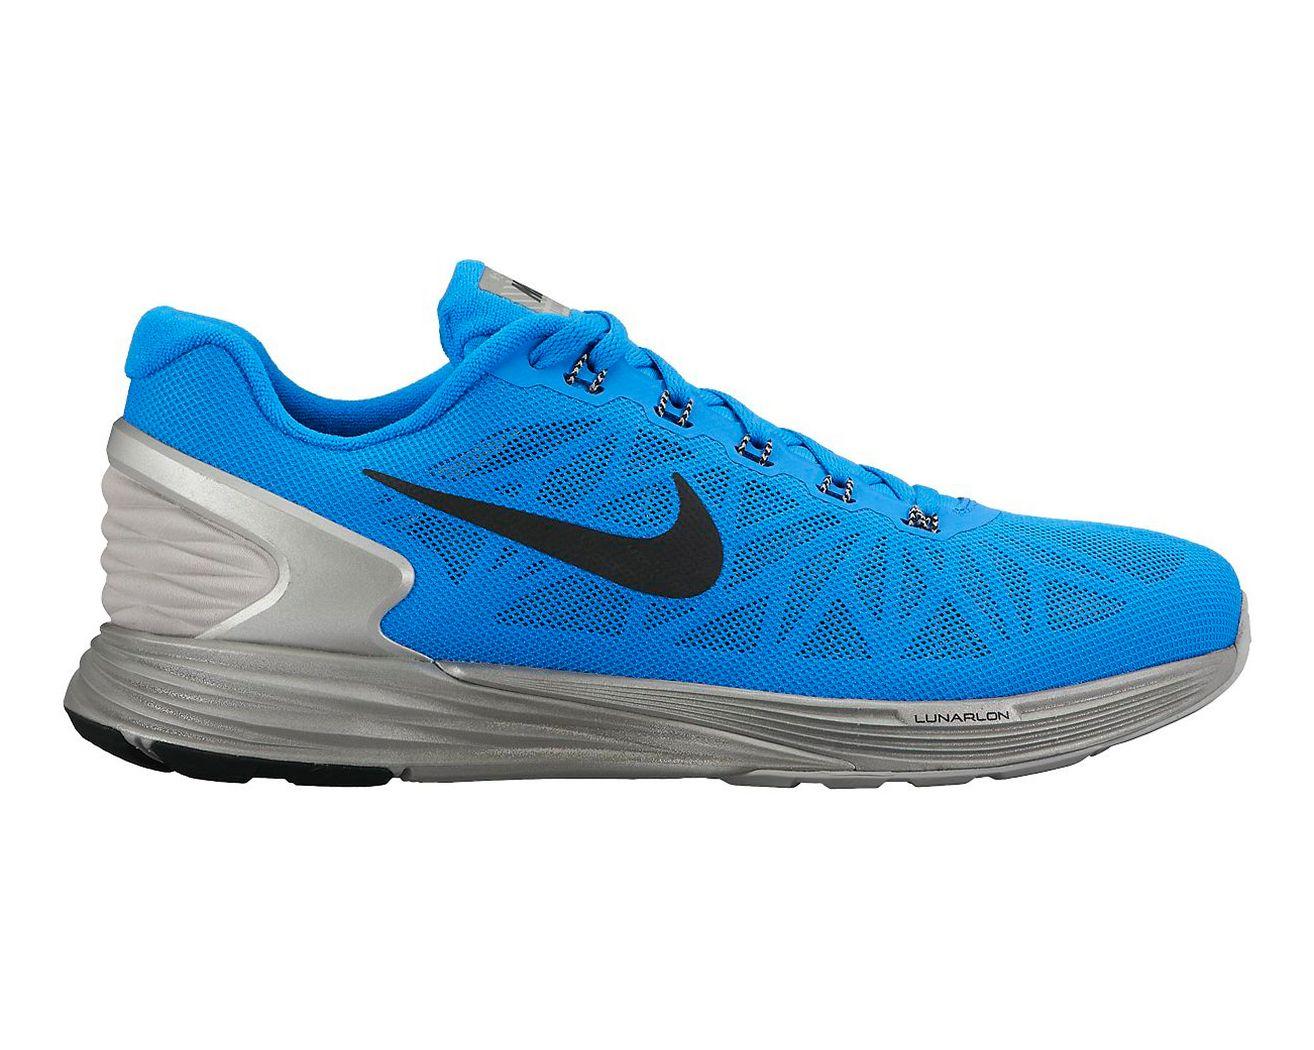 fd52e13f88ff9a ... sports Mens Nike LunarGlide 6 Flash Running Shoe at Road Runner Spo ...